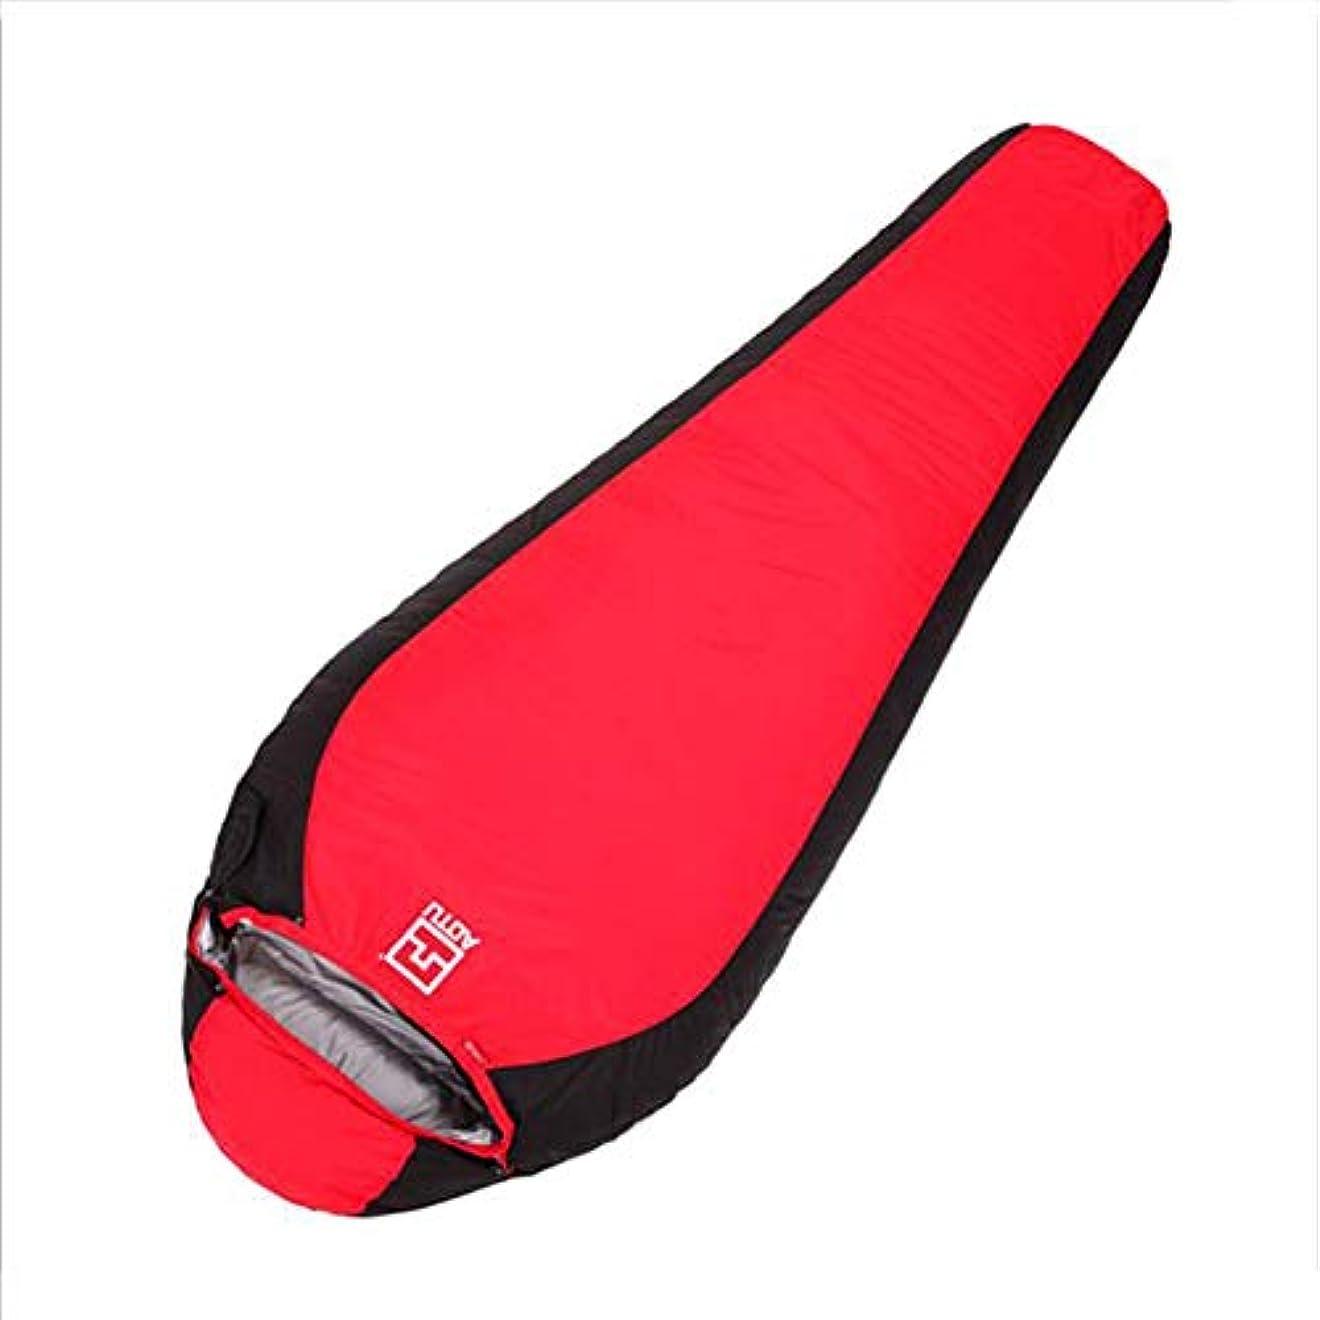 LGFV-寝袋封筒ダブル寝袋3季節暖かくて涼しい天気キャンプ用品旅行やアウトドア